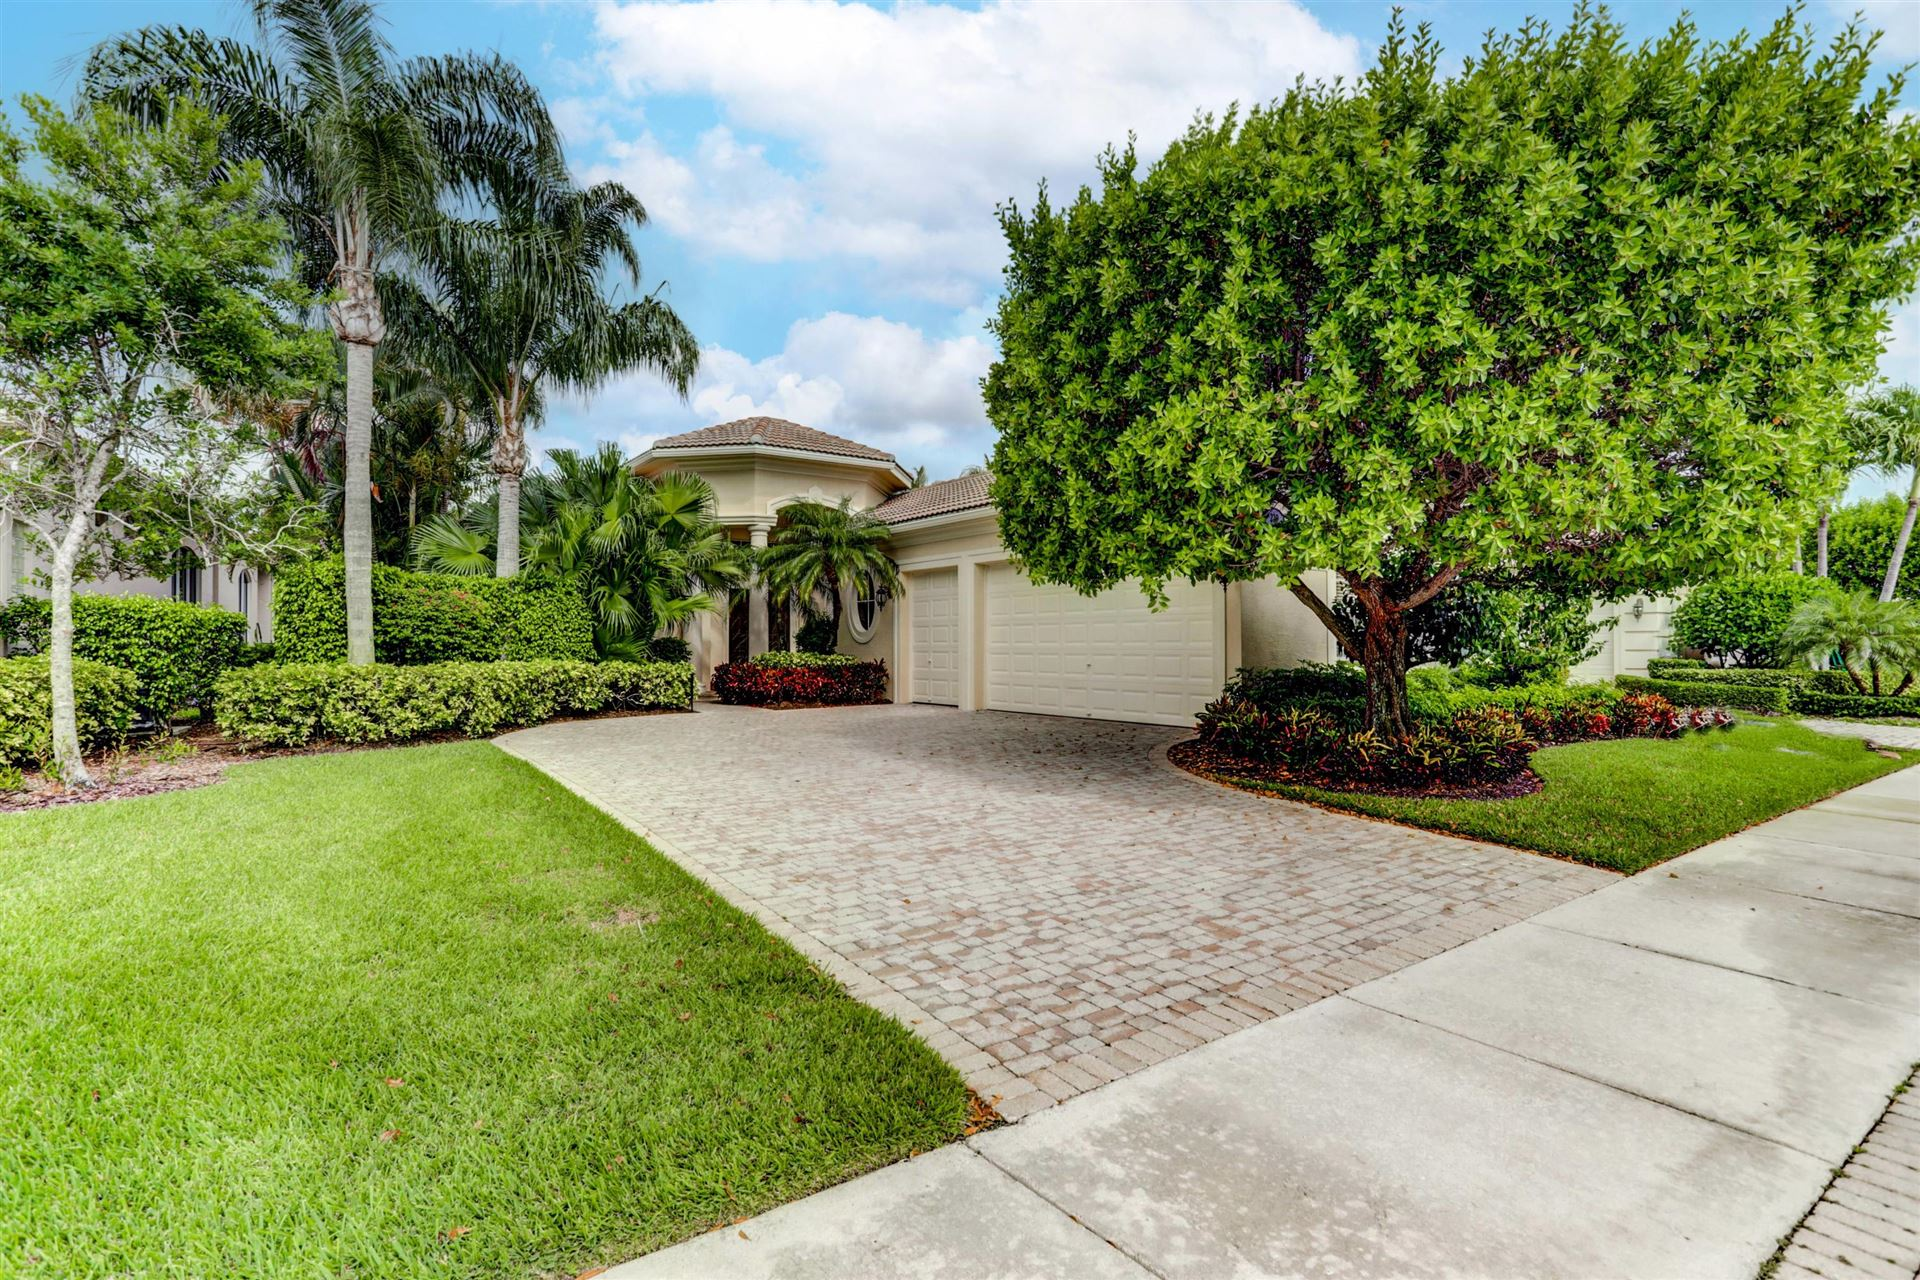 220 Porto Vecchio Way, Palm Beach Gardens, FL 33418 - MLS#: RX-10720849